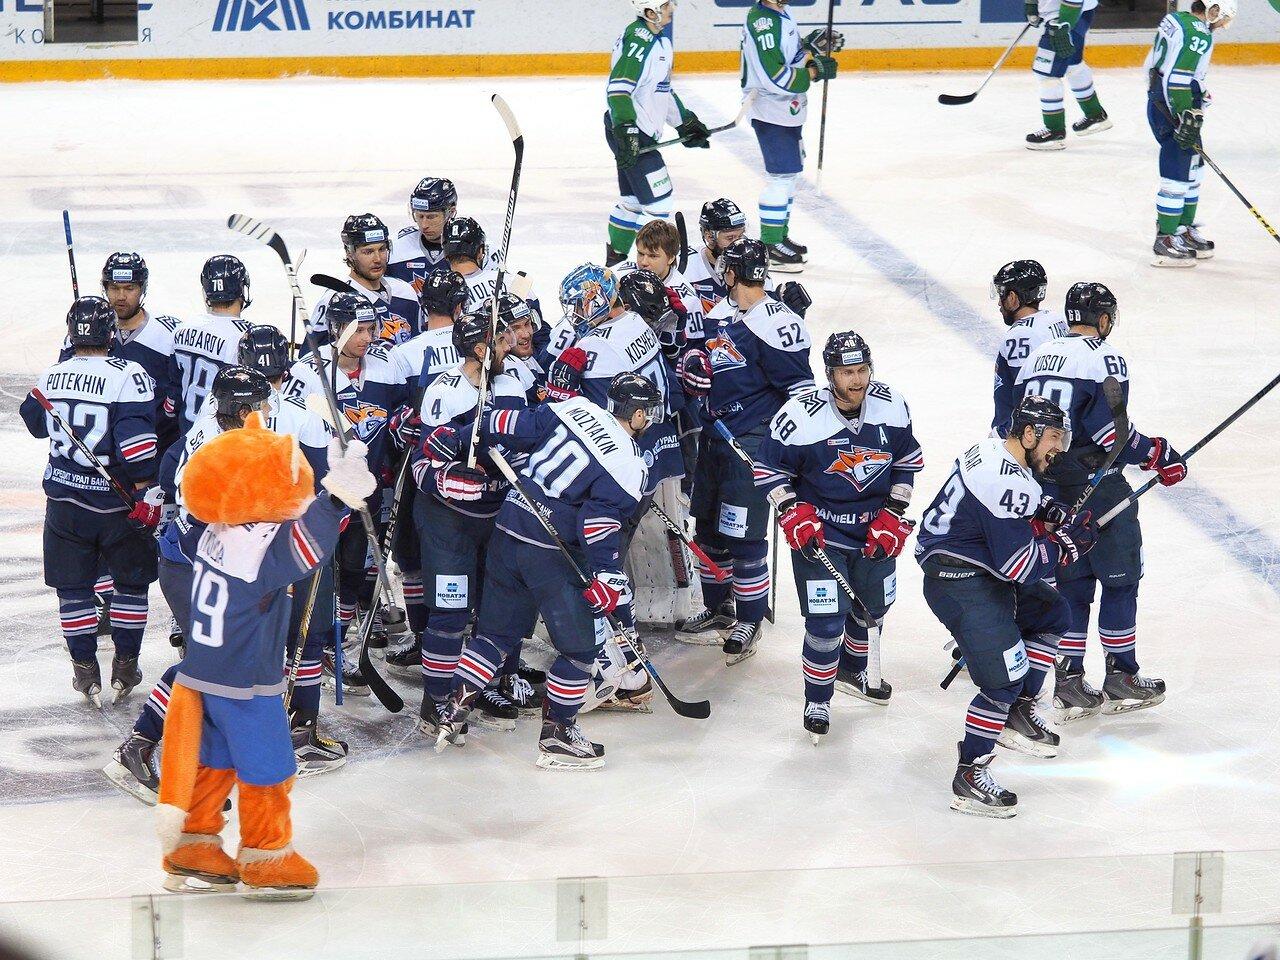 149Плей-офф 2016 Восток Финал Металлург - Салават Юлаев 23.03.2016